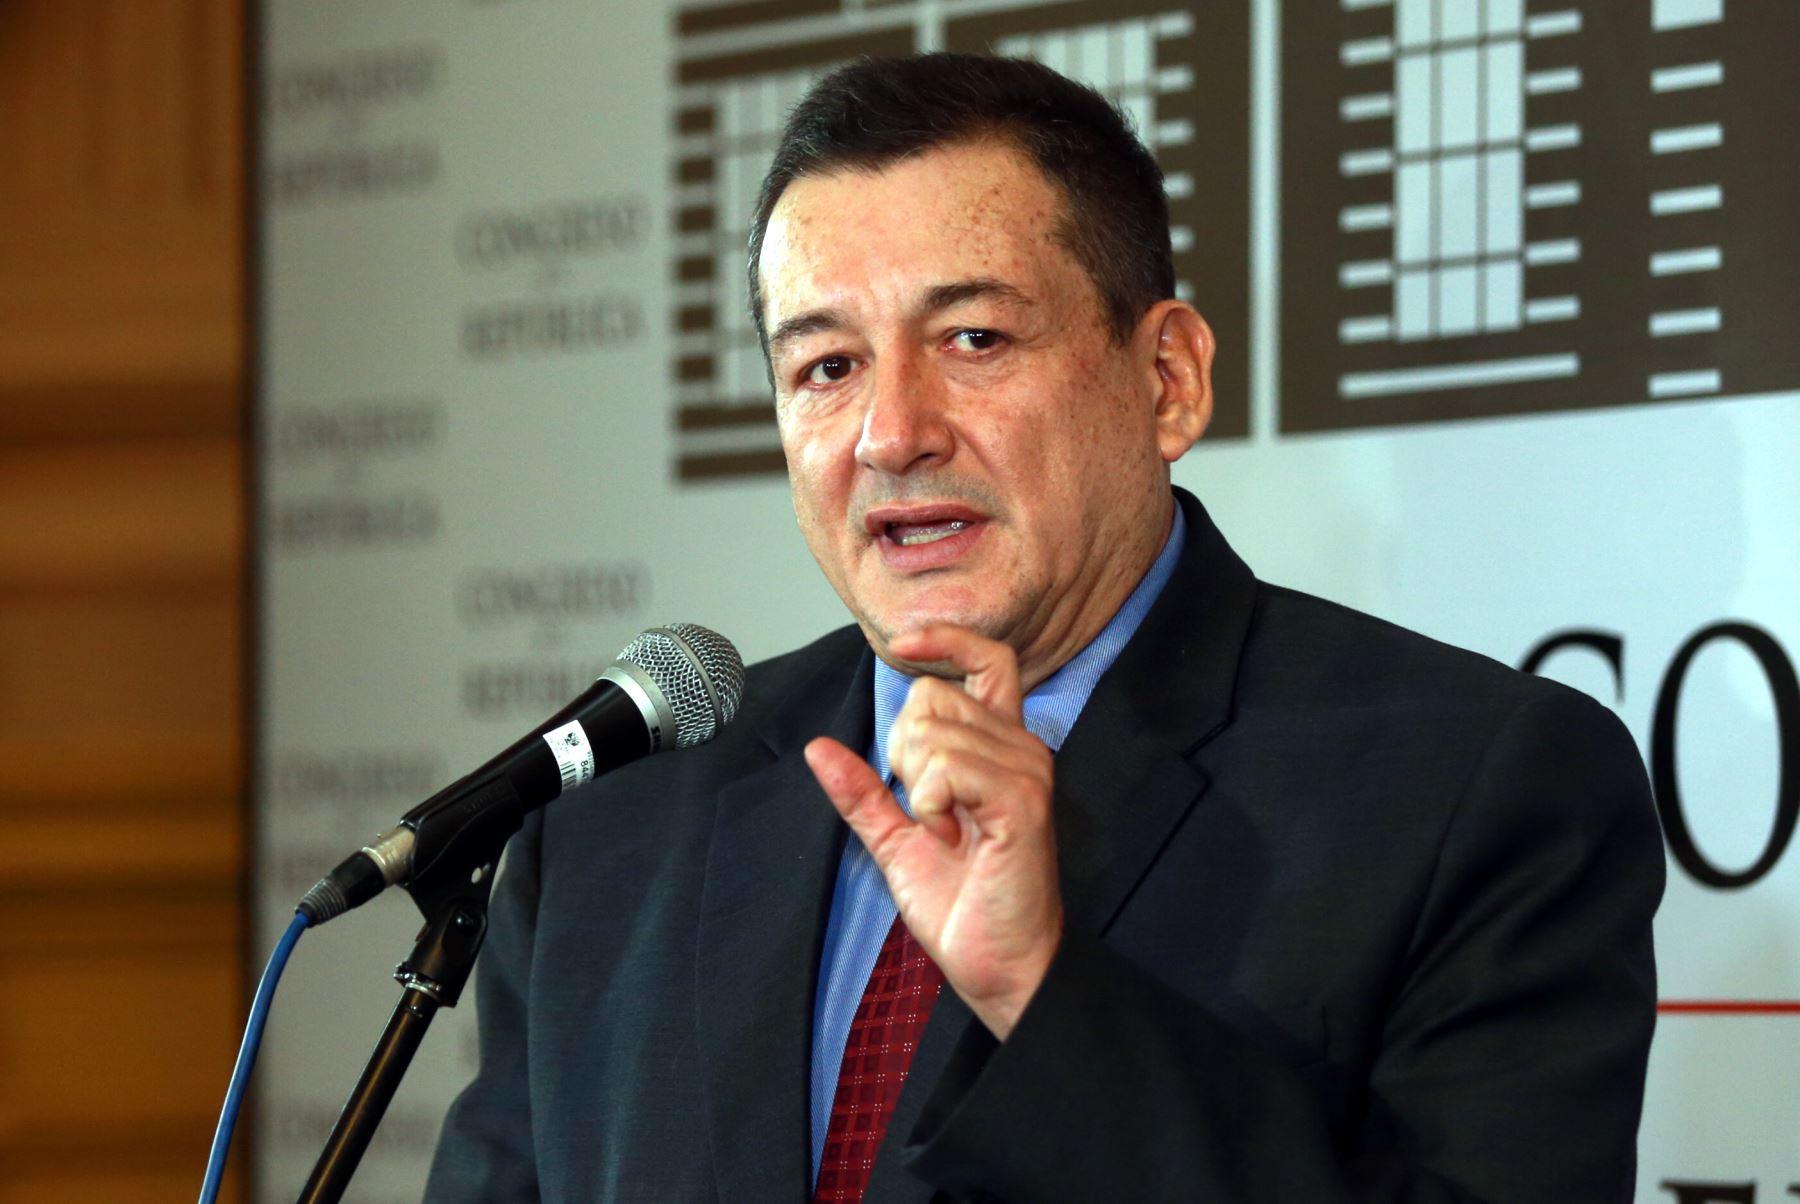 Legislador de Fuerza Popular, Rolando Reátegui. ANDINA/Jhony Laurente